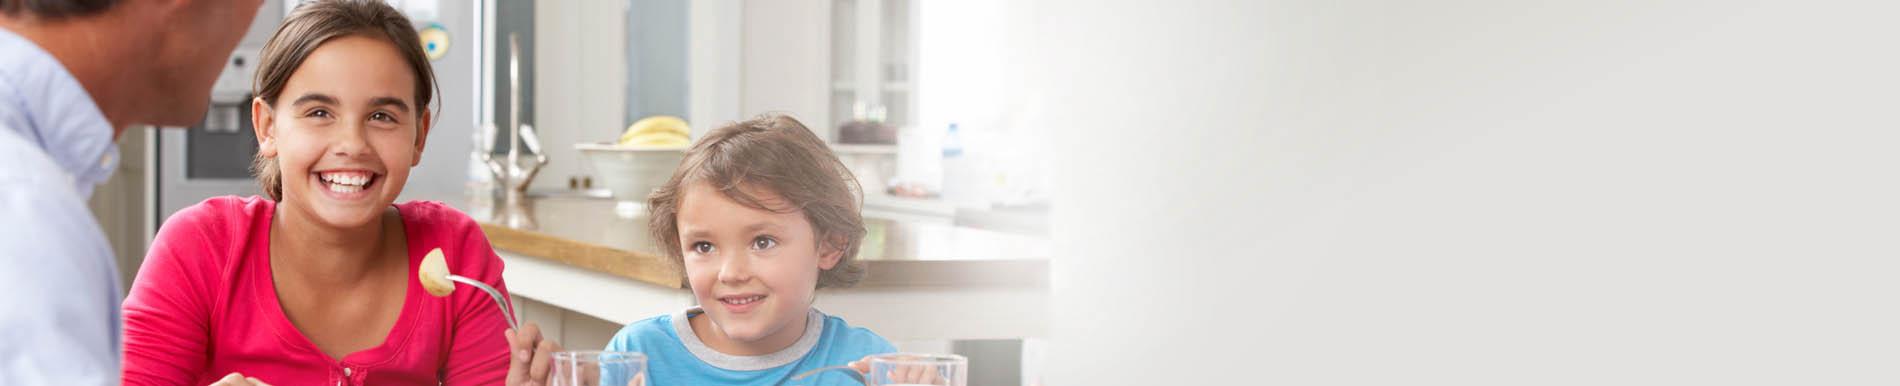 https://www.healthychildren.org/SiteCollectionImage-Homepage-Banners/Family_dinnerTime_Banner.jpg